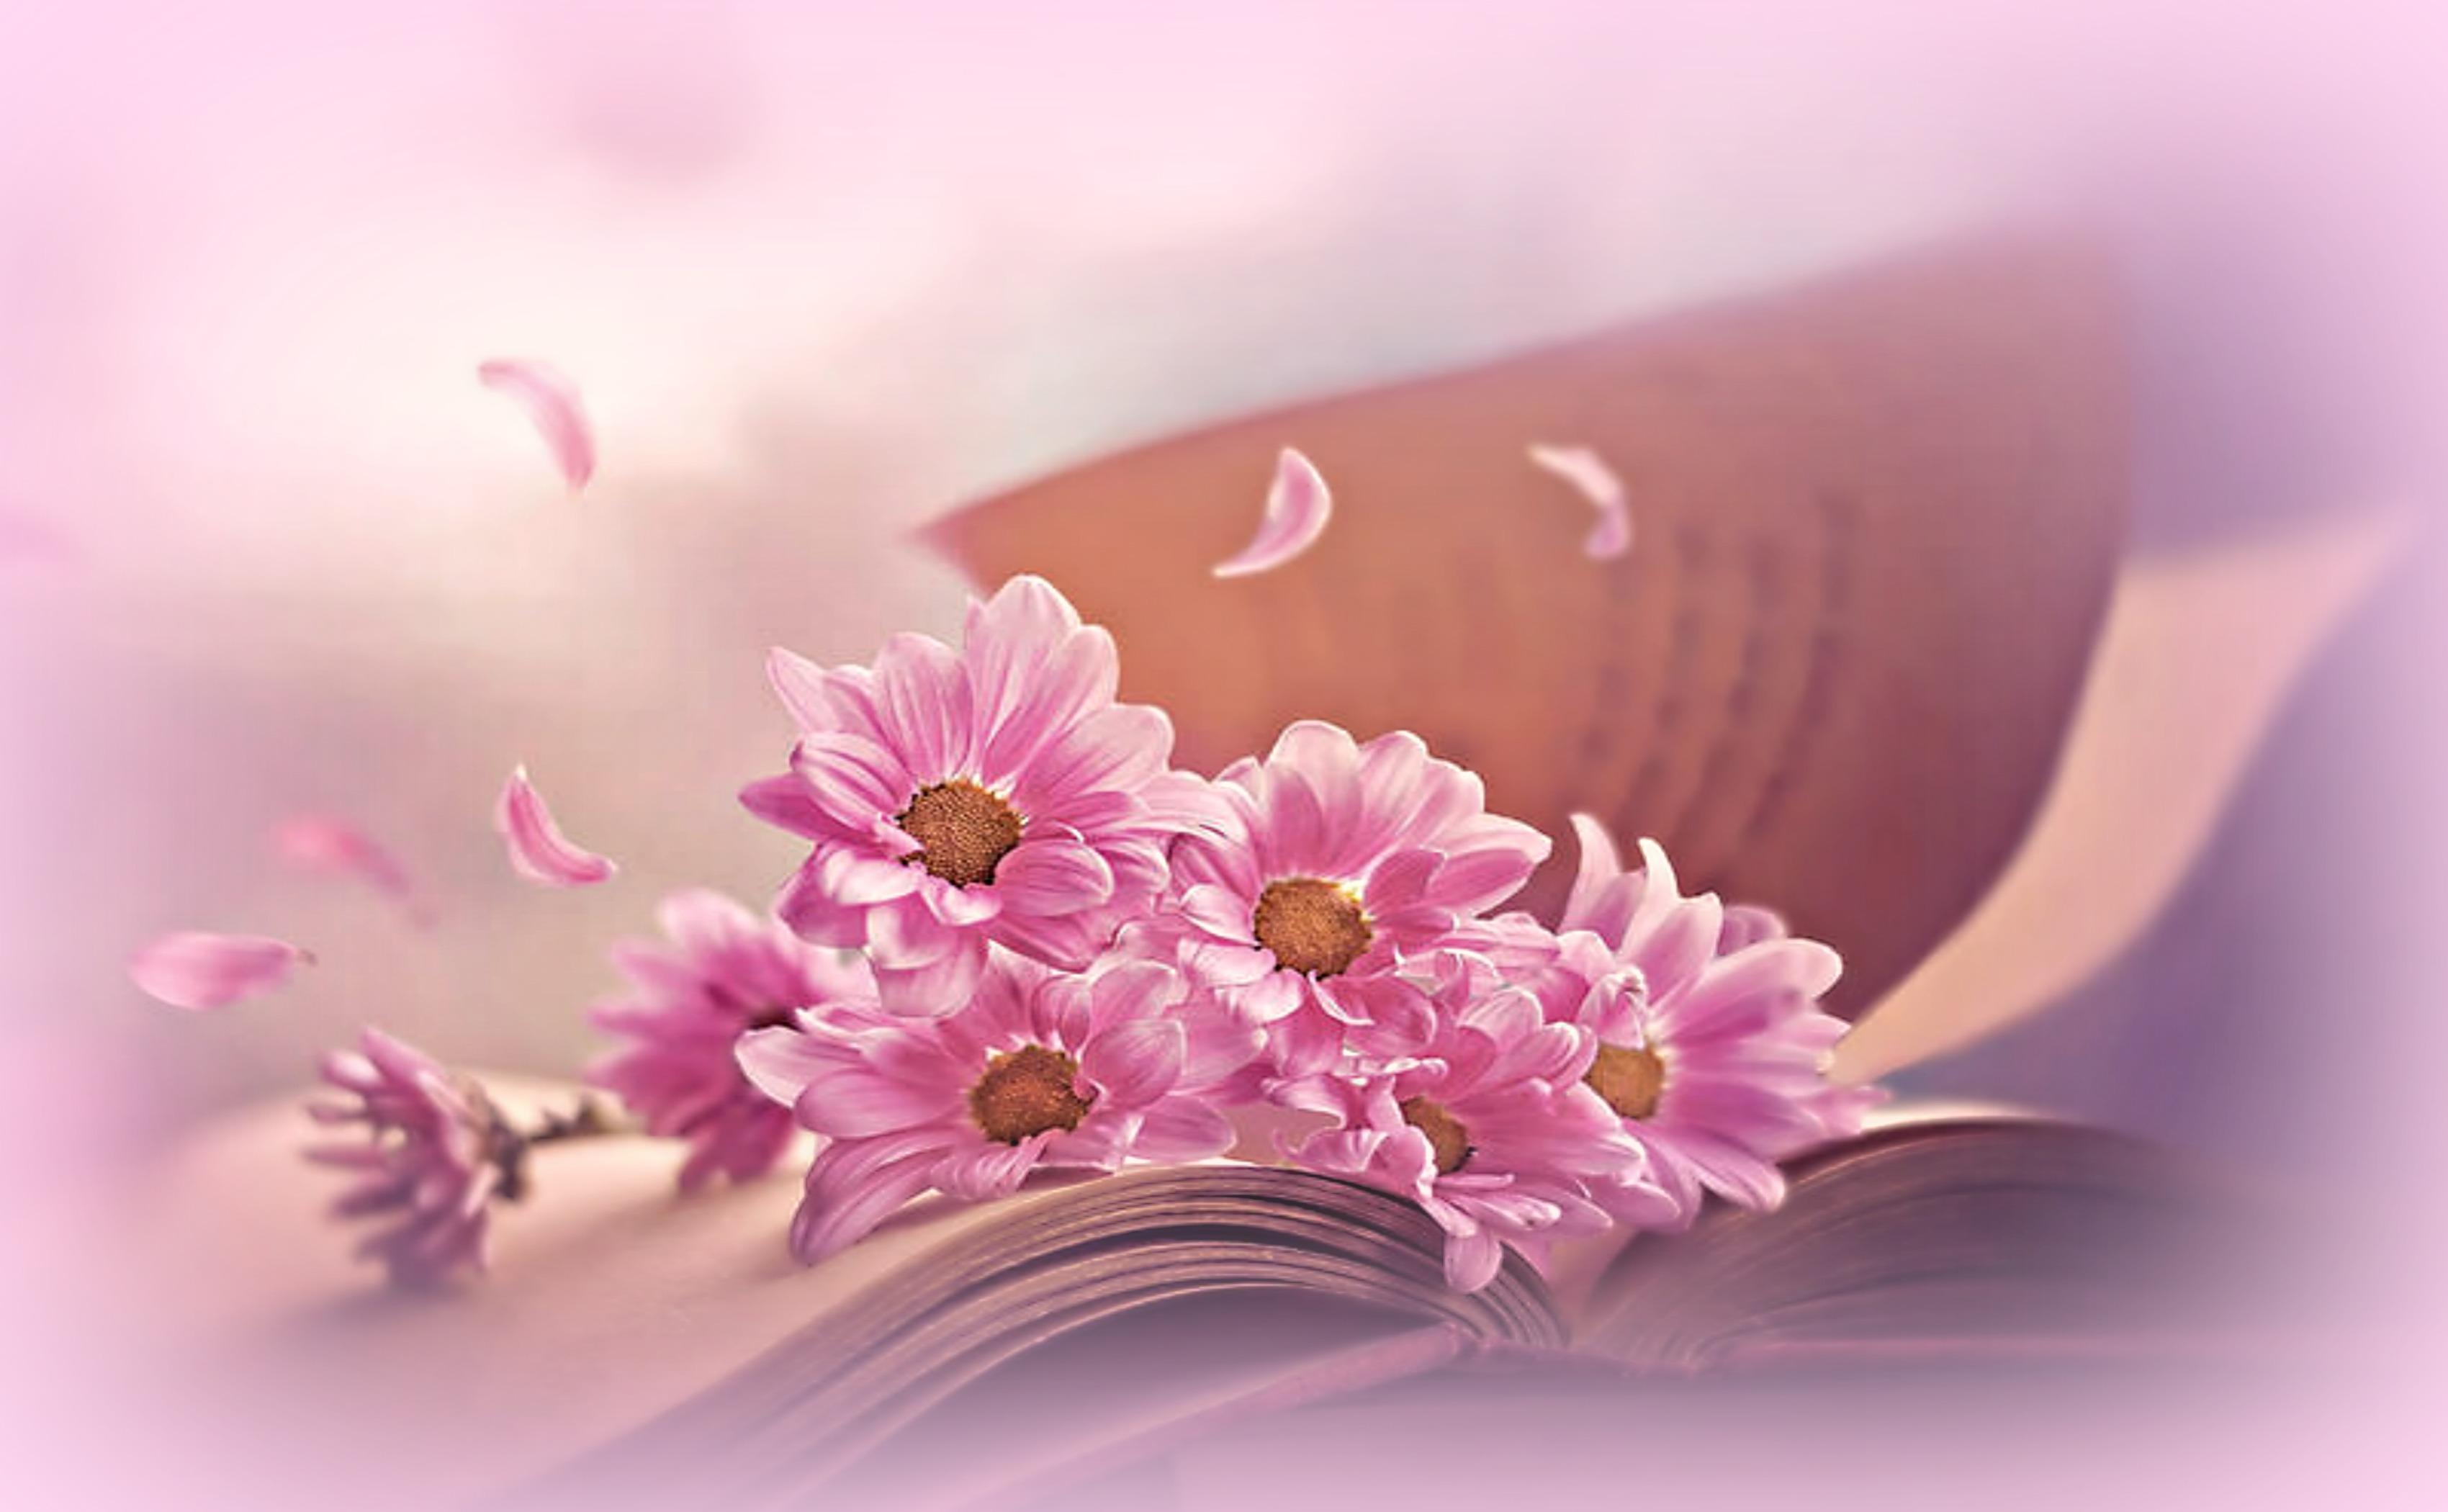 Browsing Bliss Awaits You